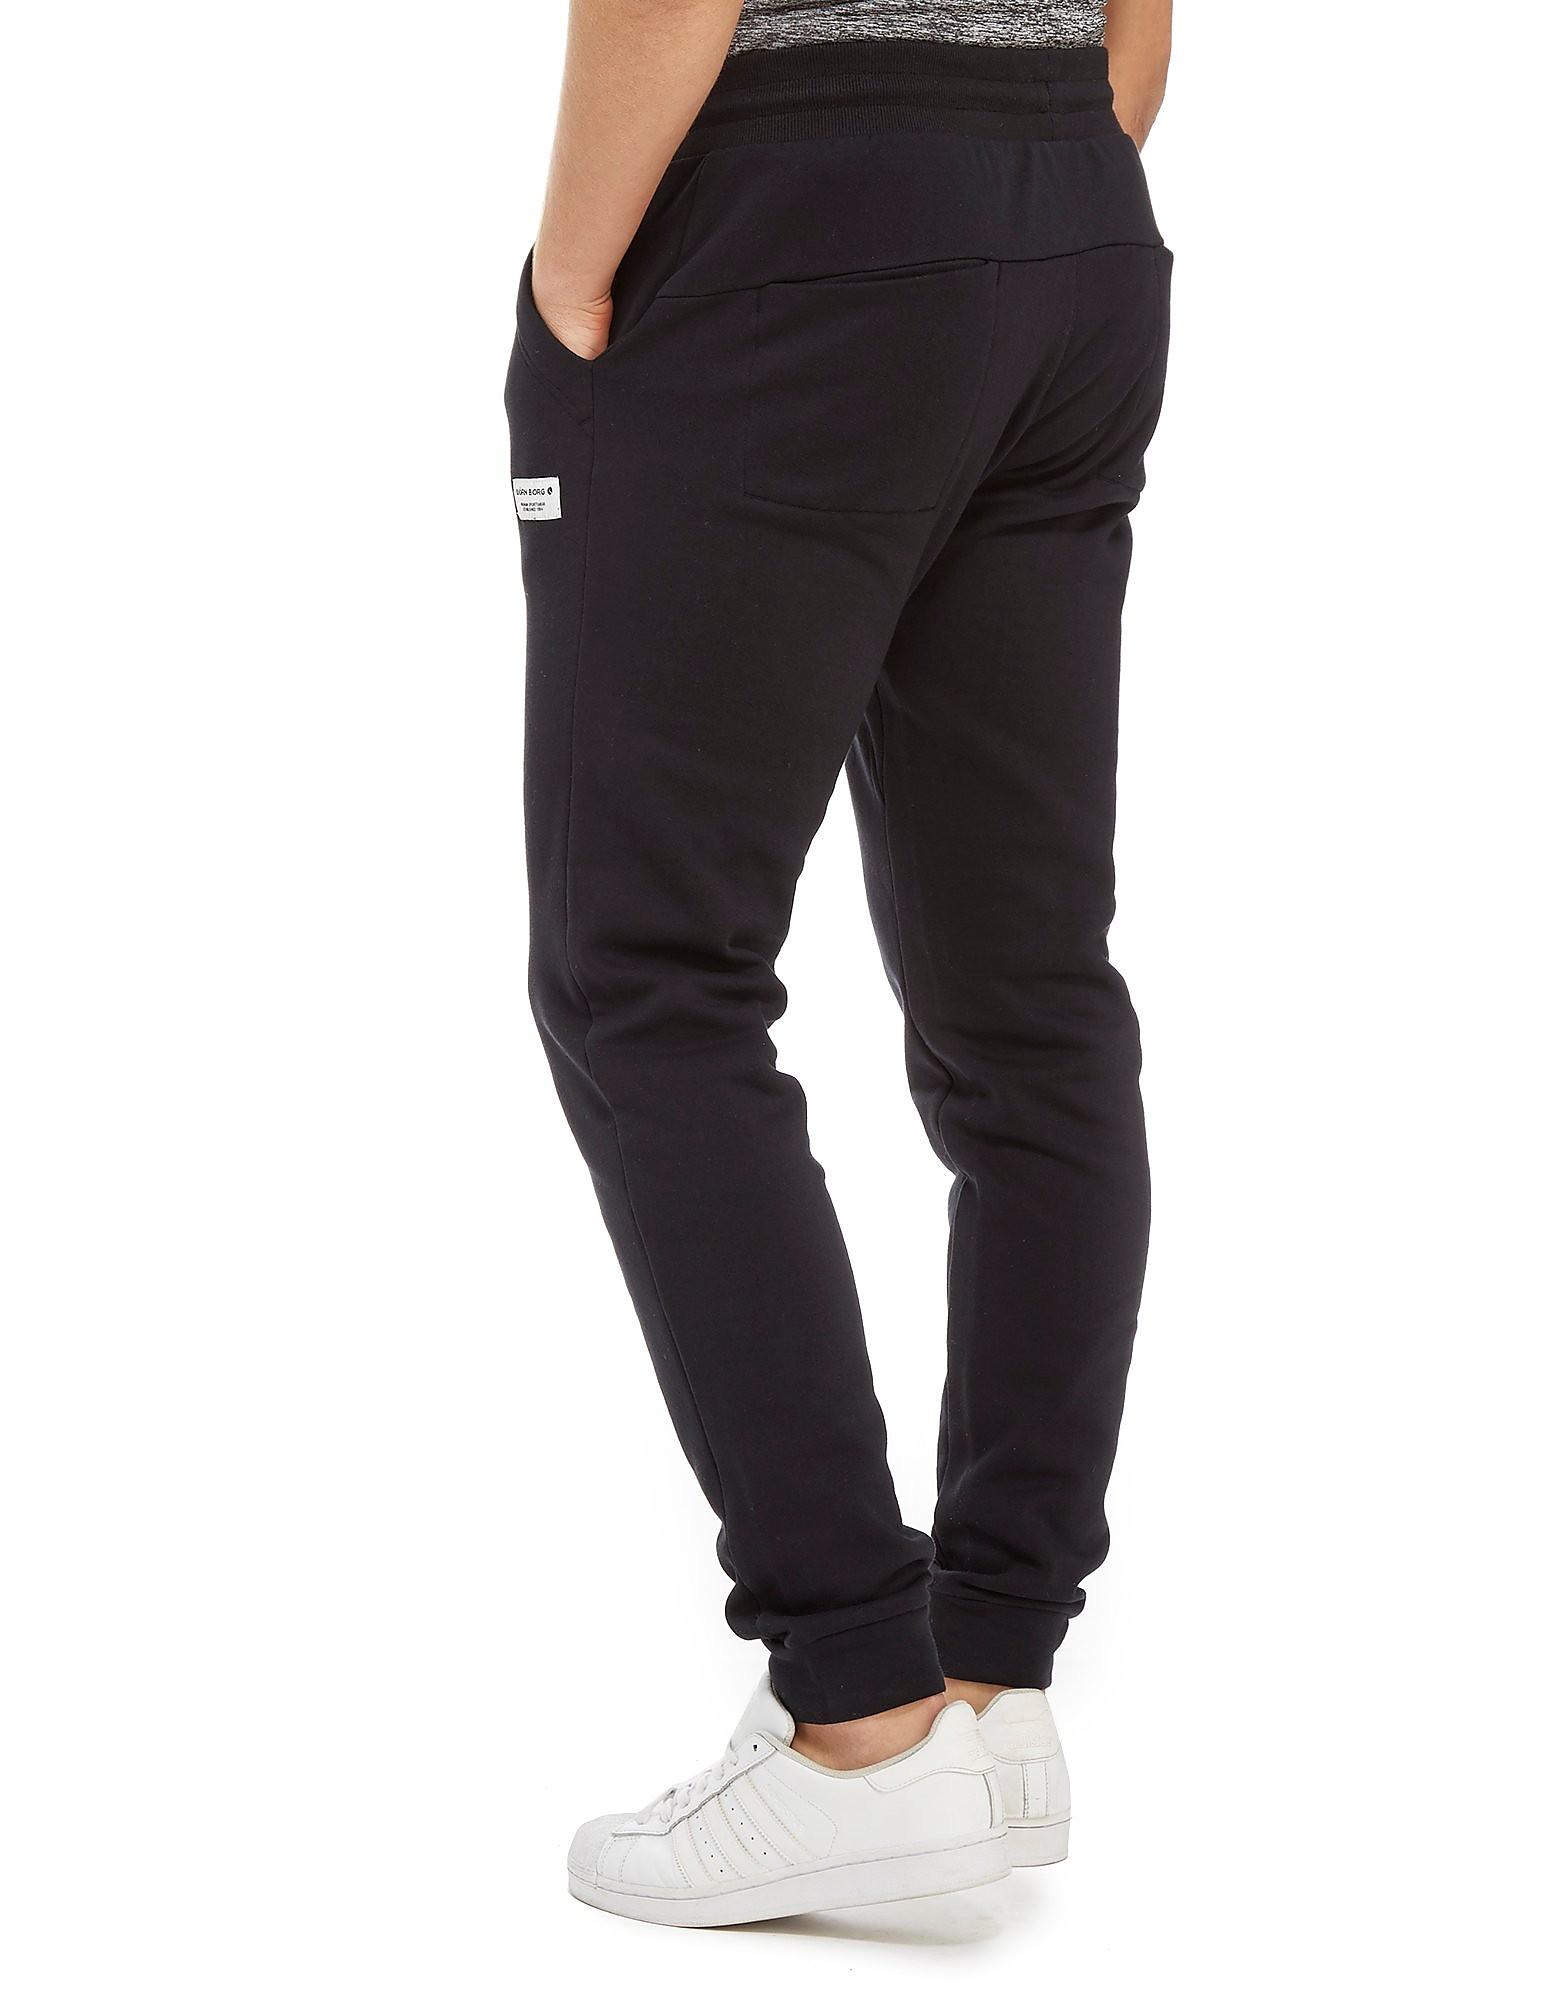 Bjorn Borg Core Fleece Pants